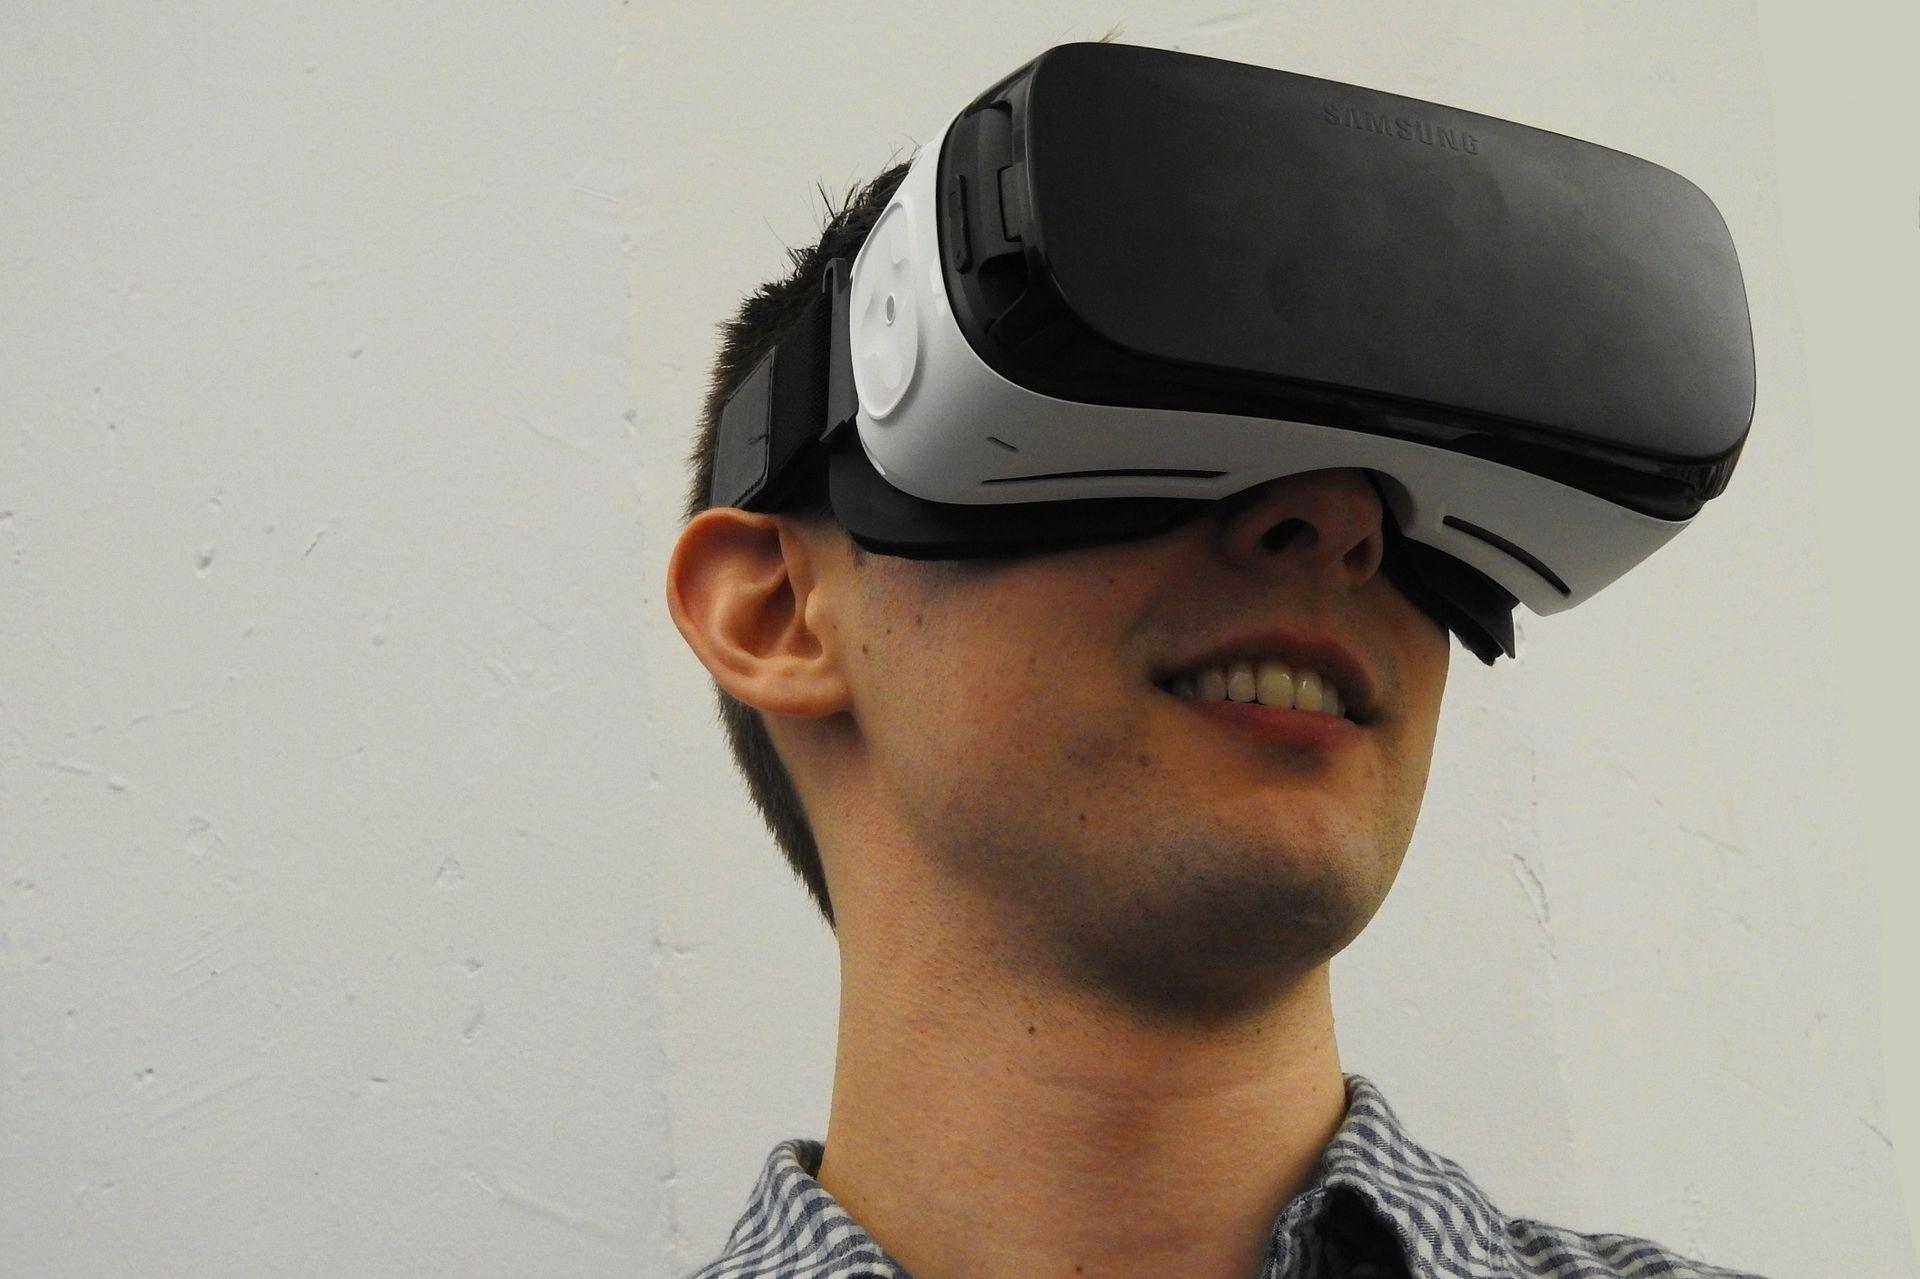 Virtual reality gnhtrg